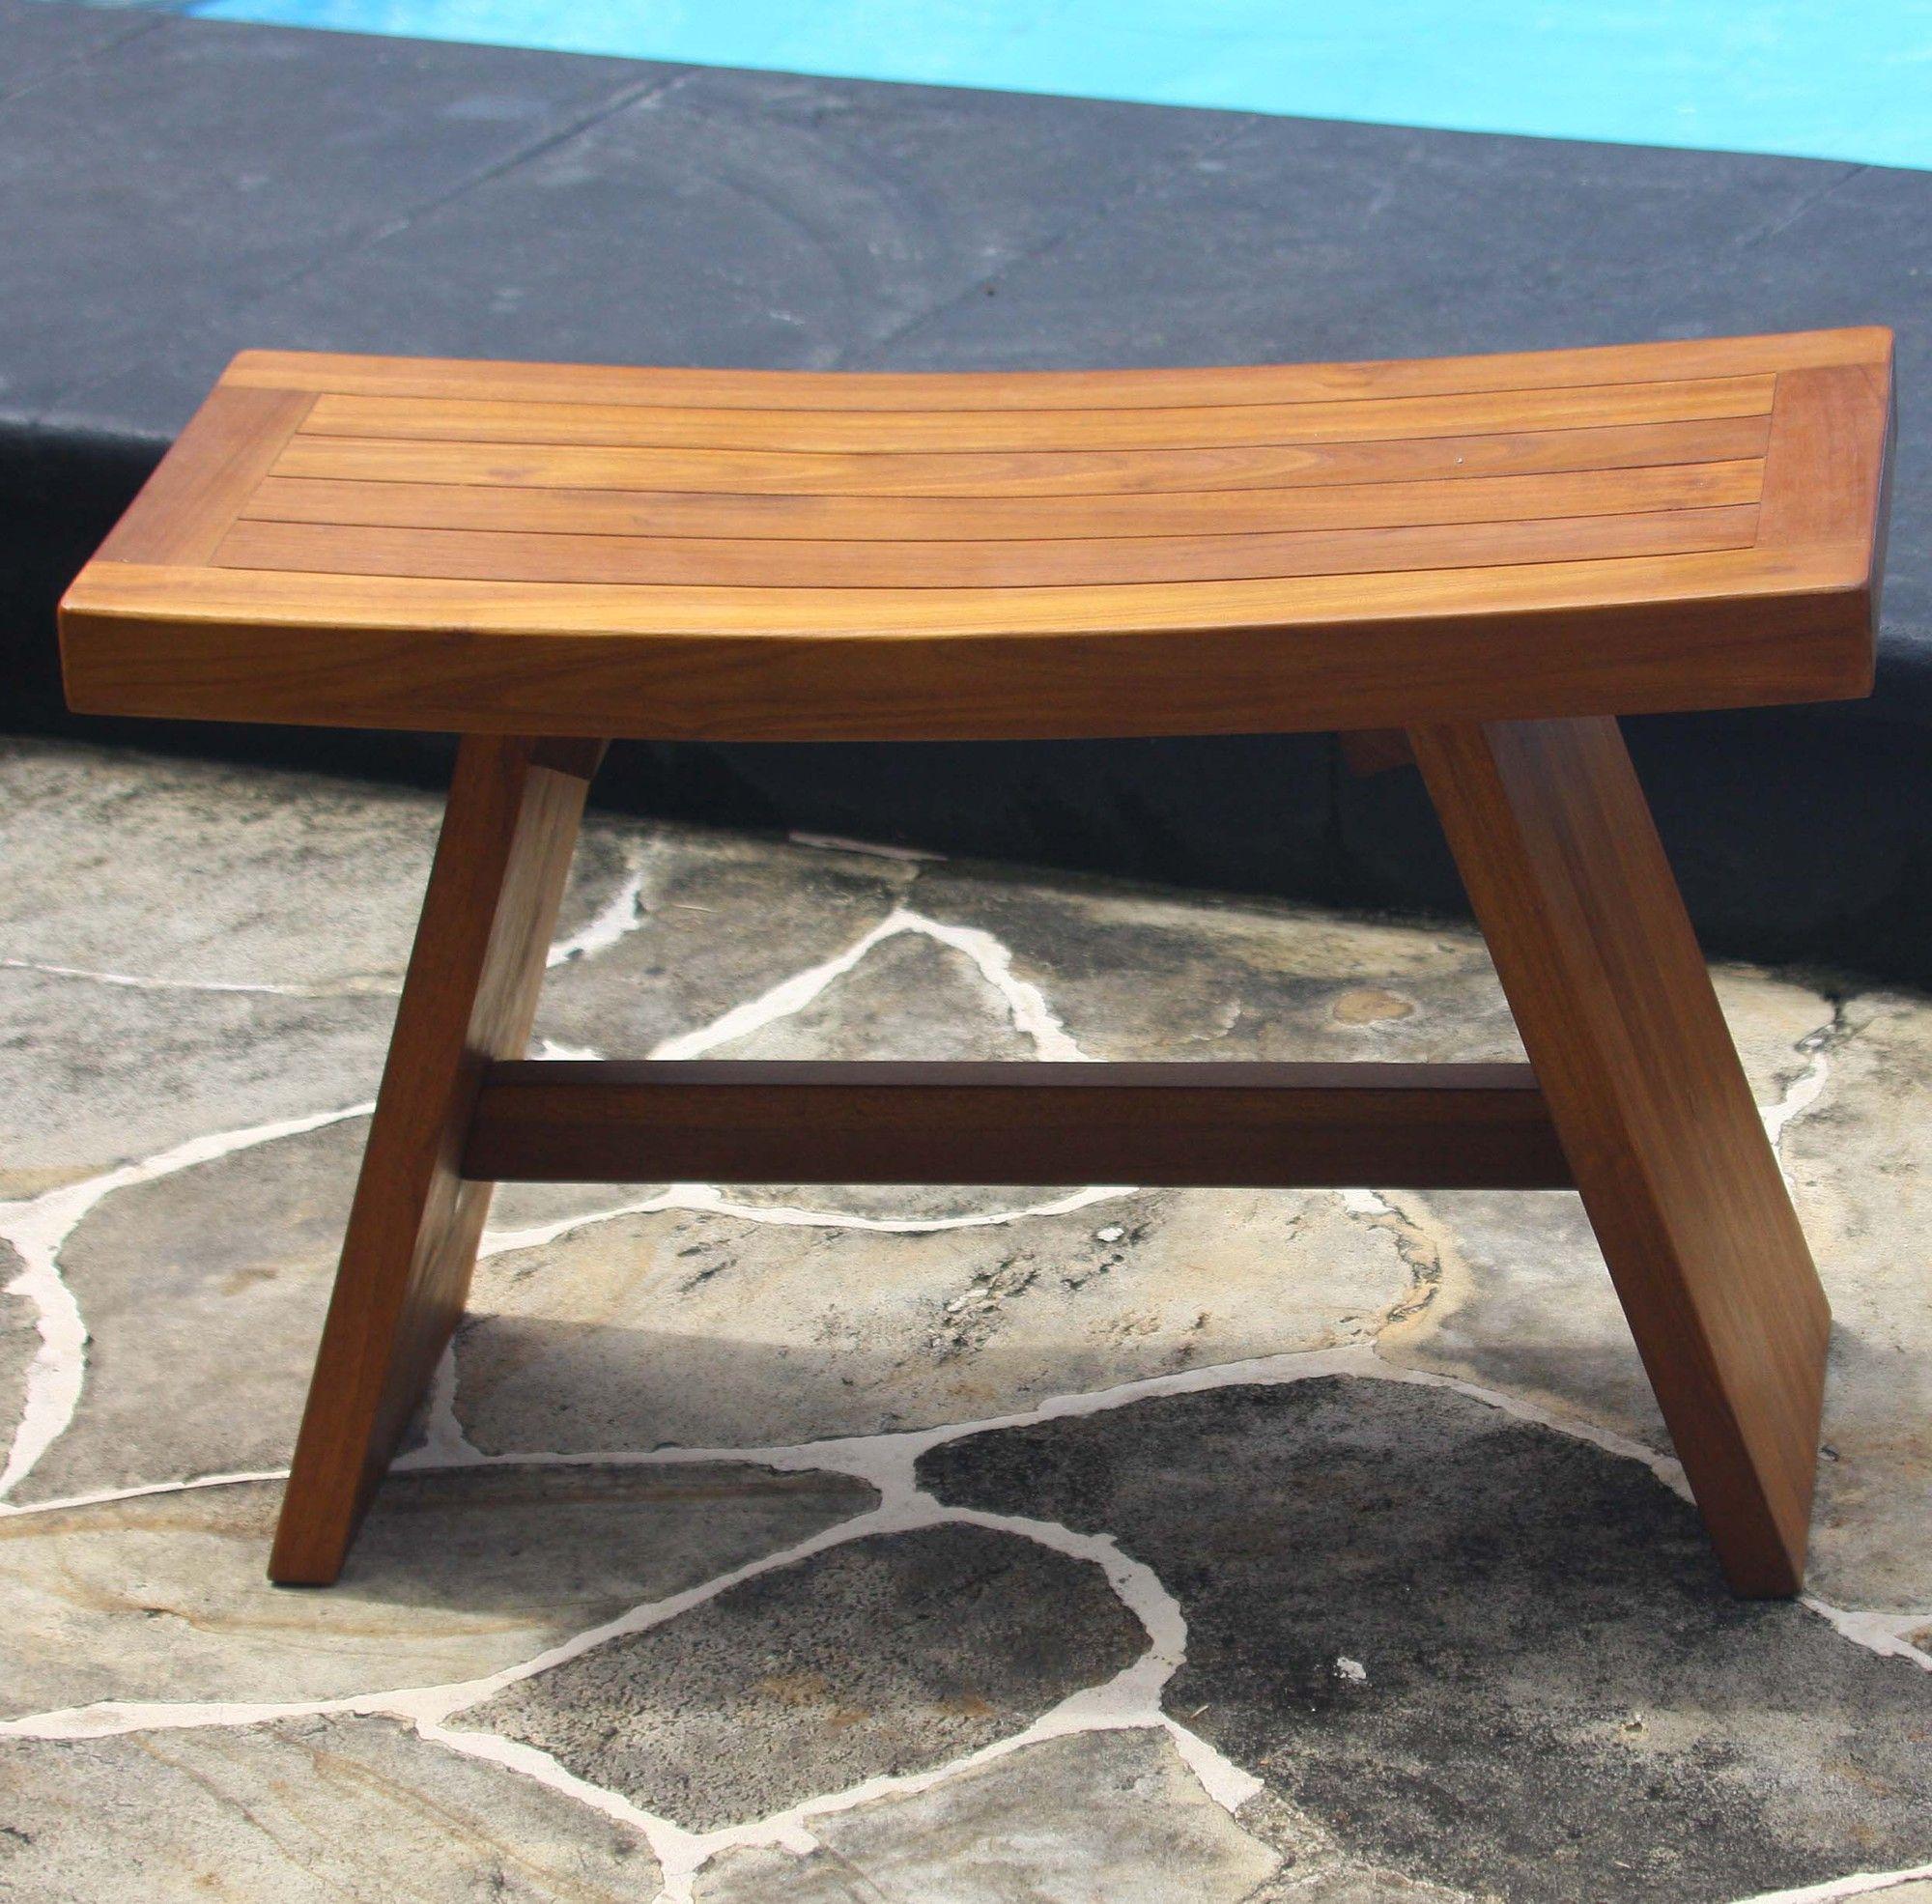 Best 25 Bathroom Bench Ideas On Pinterest Diy Wood Bench Wooden Benches And Rustic Wooden Bench